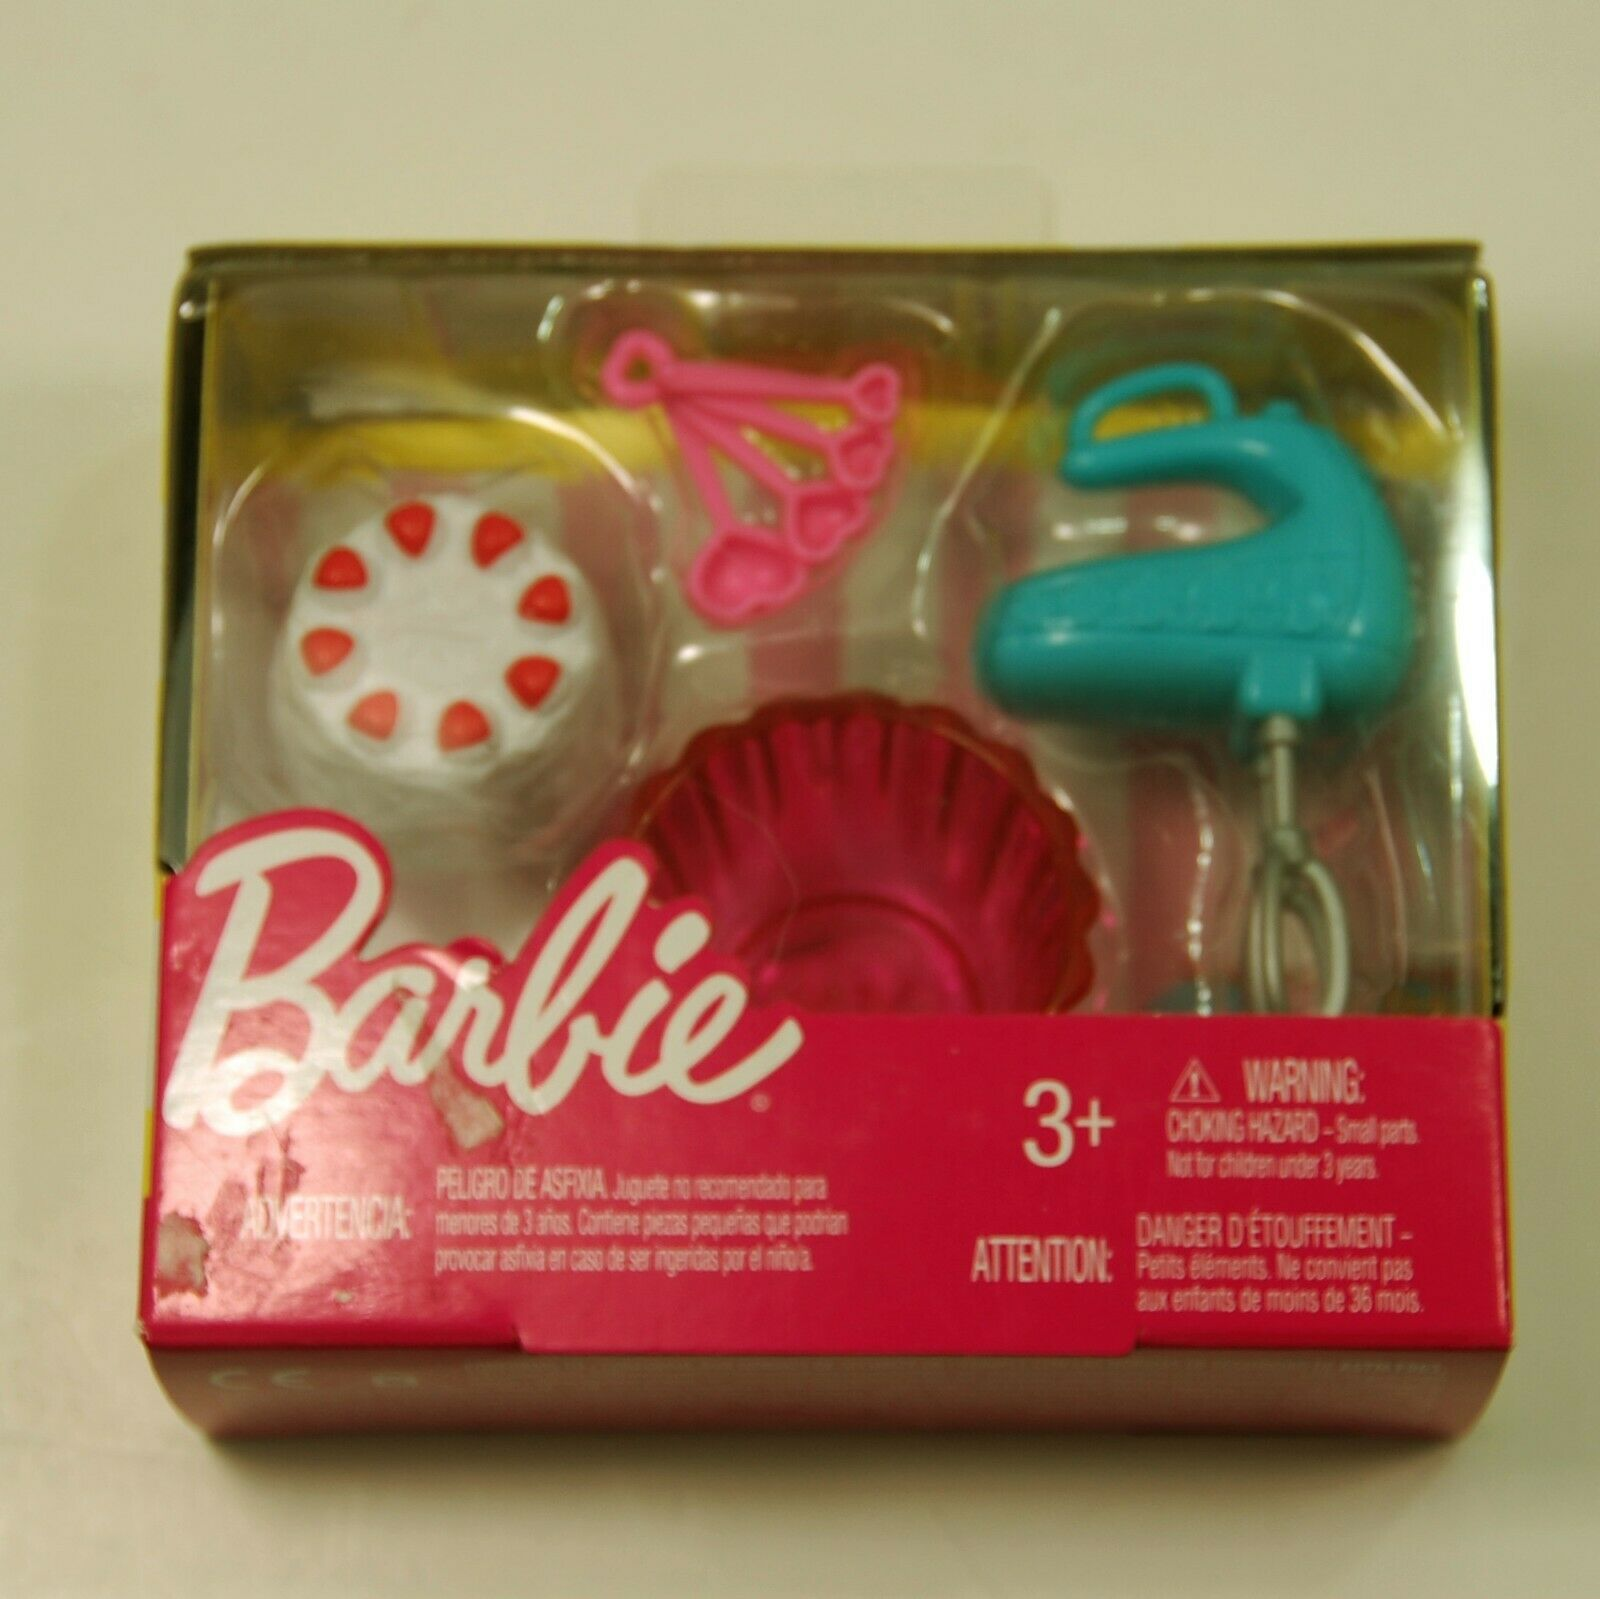 Set of 3 Barbie Cooking Baking Accessory Breakfast Cake Pasta Mixer Food Kitchen